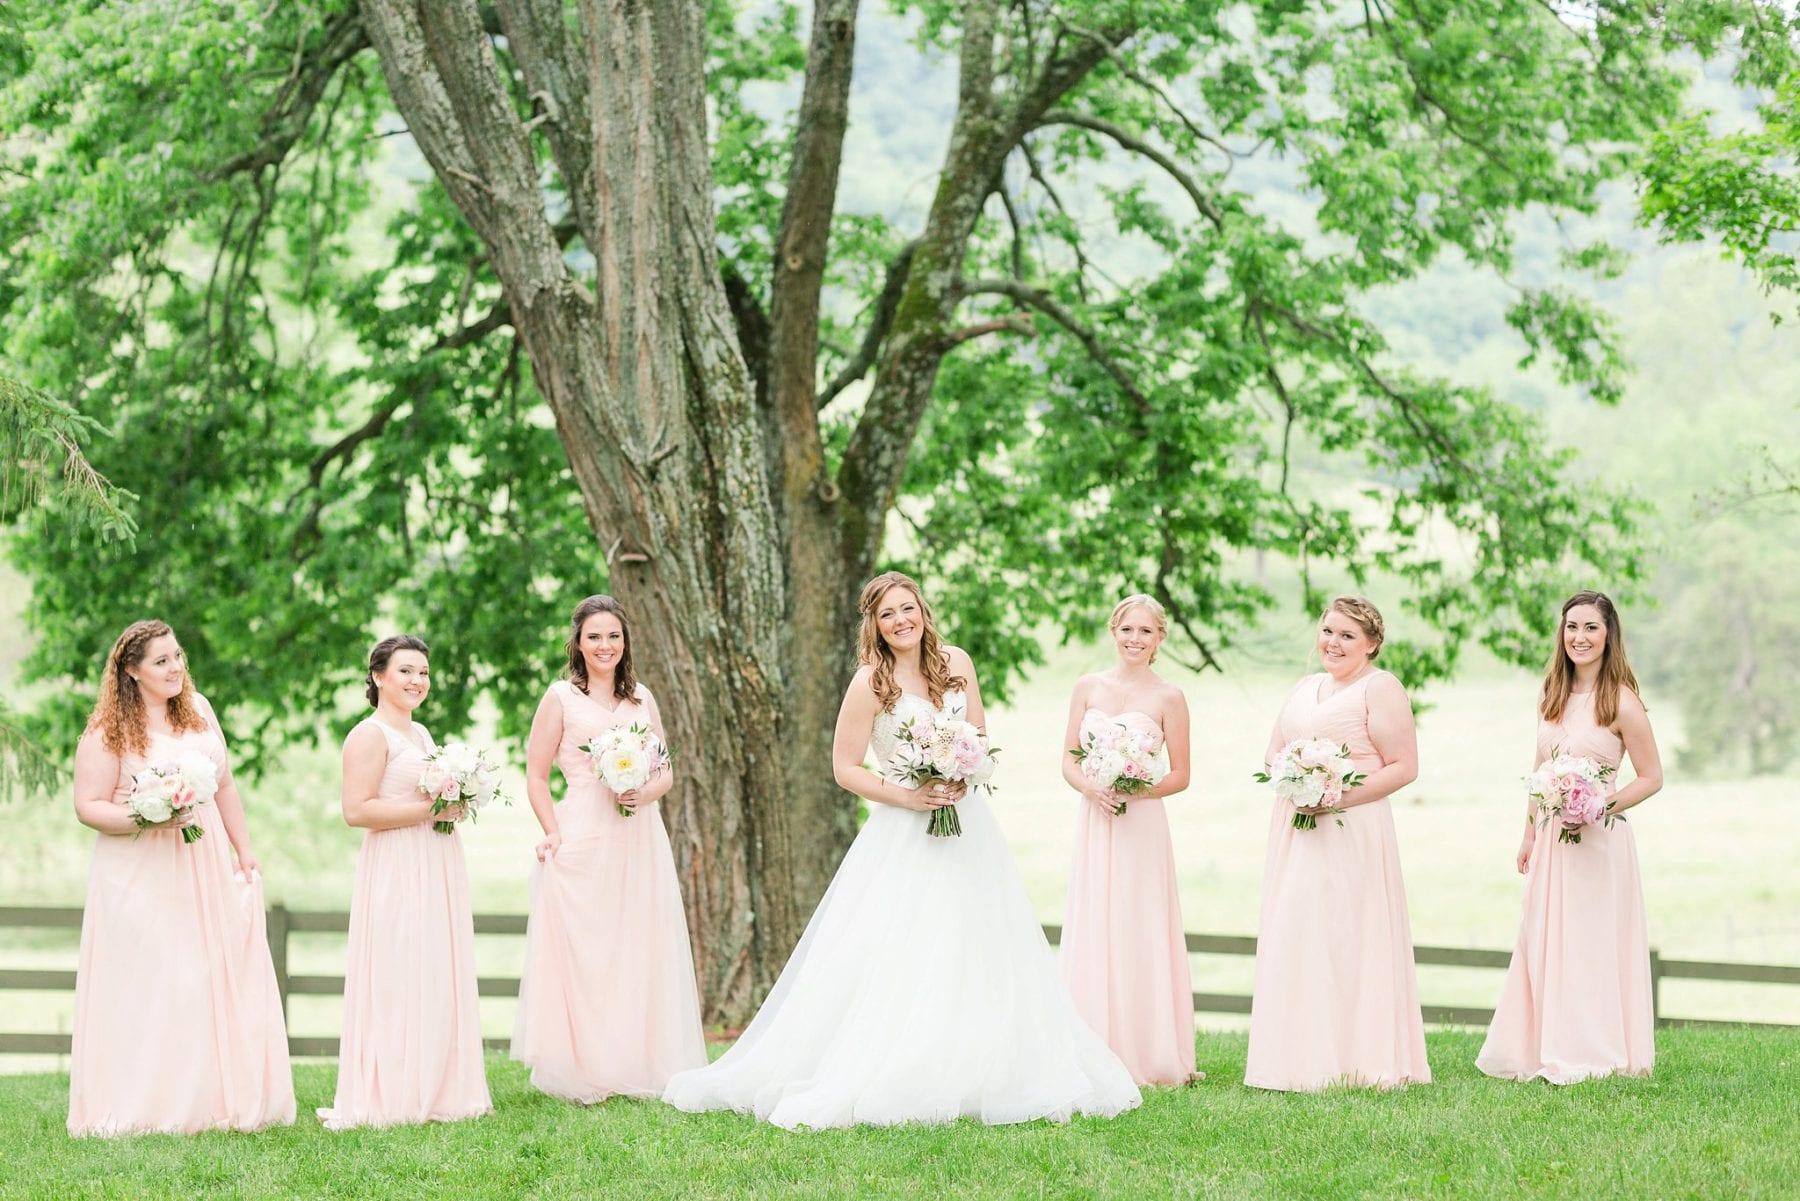 Justin & Megan Big Spring Farm Wedding Photos-146.jpg